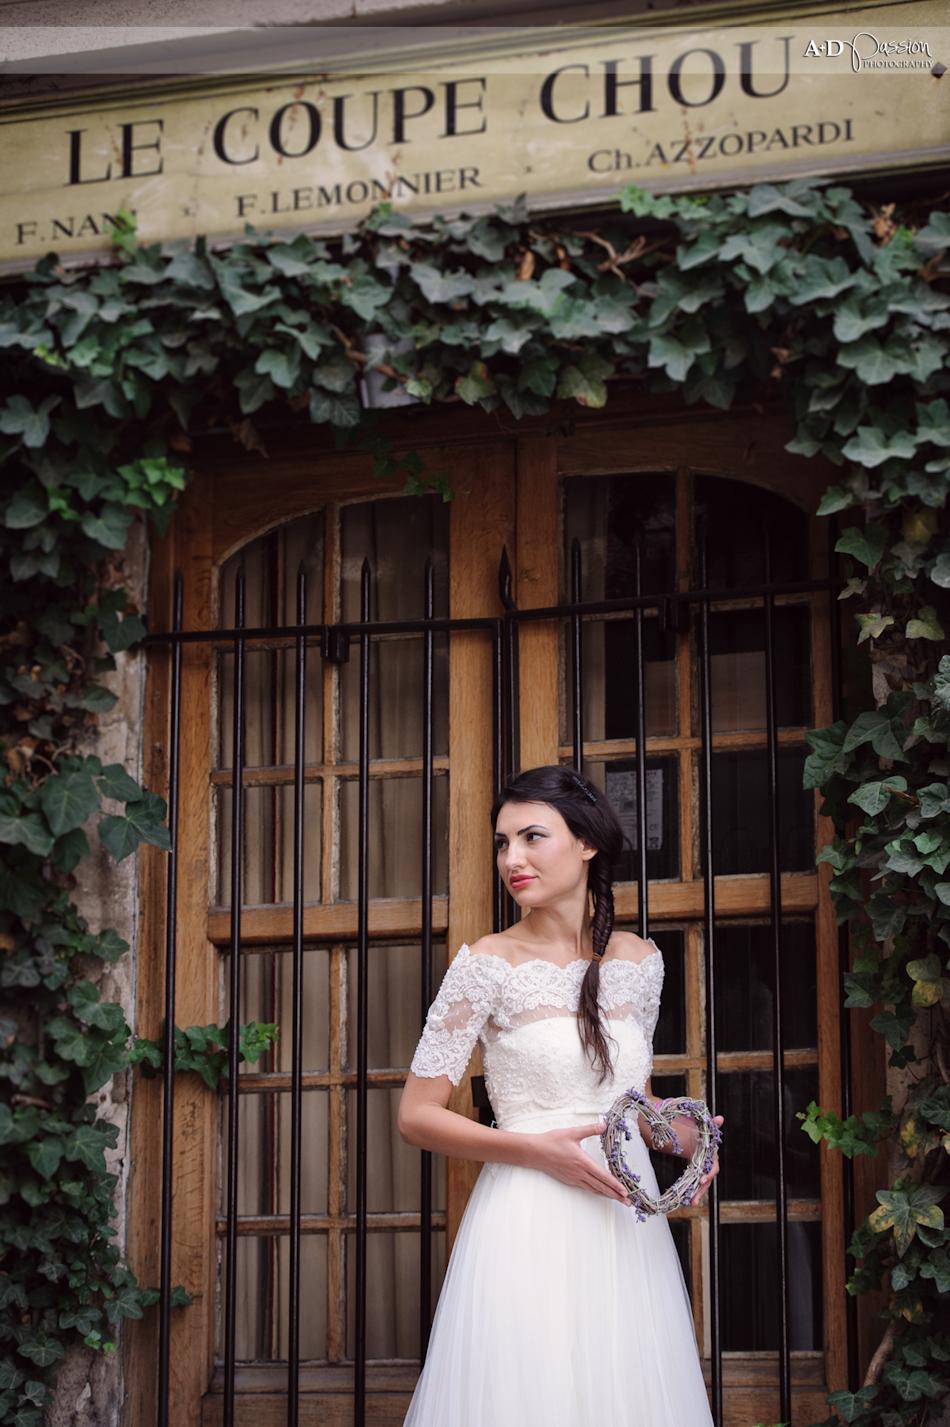 AD Passion Photography | 20120902_ad-passion_fotograf-profesionist-de-nunta_Andreea&Adi_AfterWedding-TrashTheDress_Paris_0084 | Adelin, Dida, fotograf profesionist, fotograf de nunta, fotografie de nunta, fotograf Timisoara, fotograf Craiova, fotograf Bucuresti, fotograf Arad, nunta Timisoara, nunta Arad, nunta Bucuresti, nunta Craiova